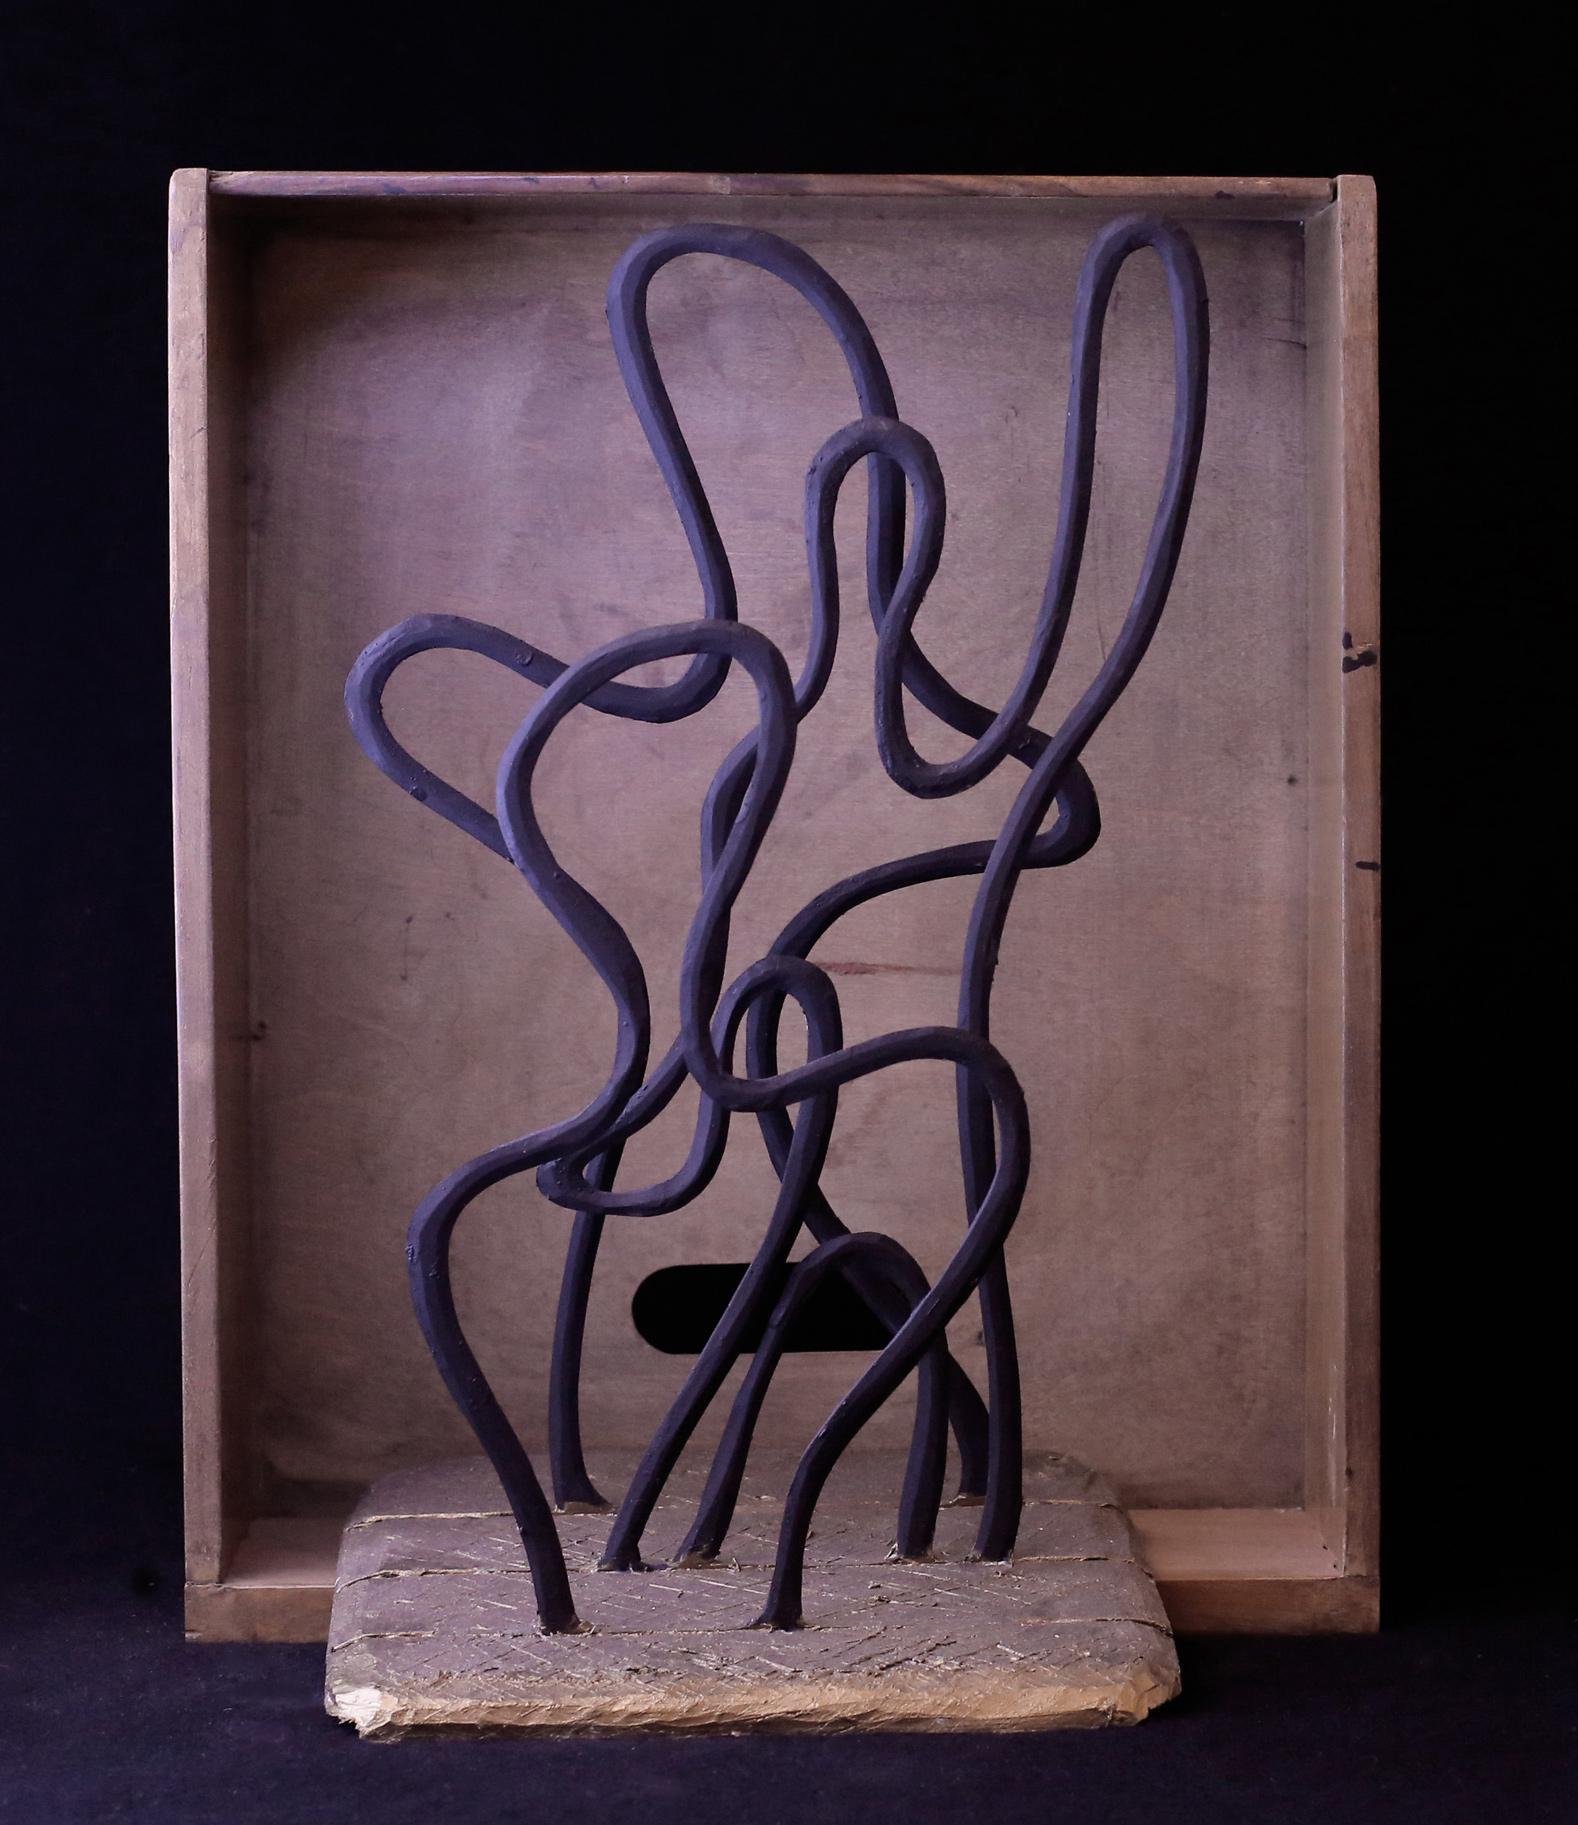 Kazuyo Komoda, polyplat, 18x15x35 cm, edition of 6